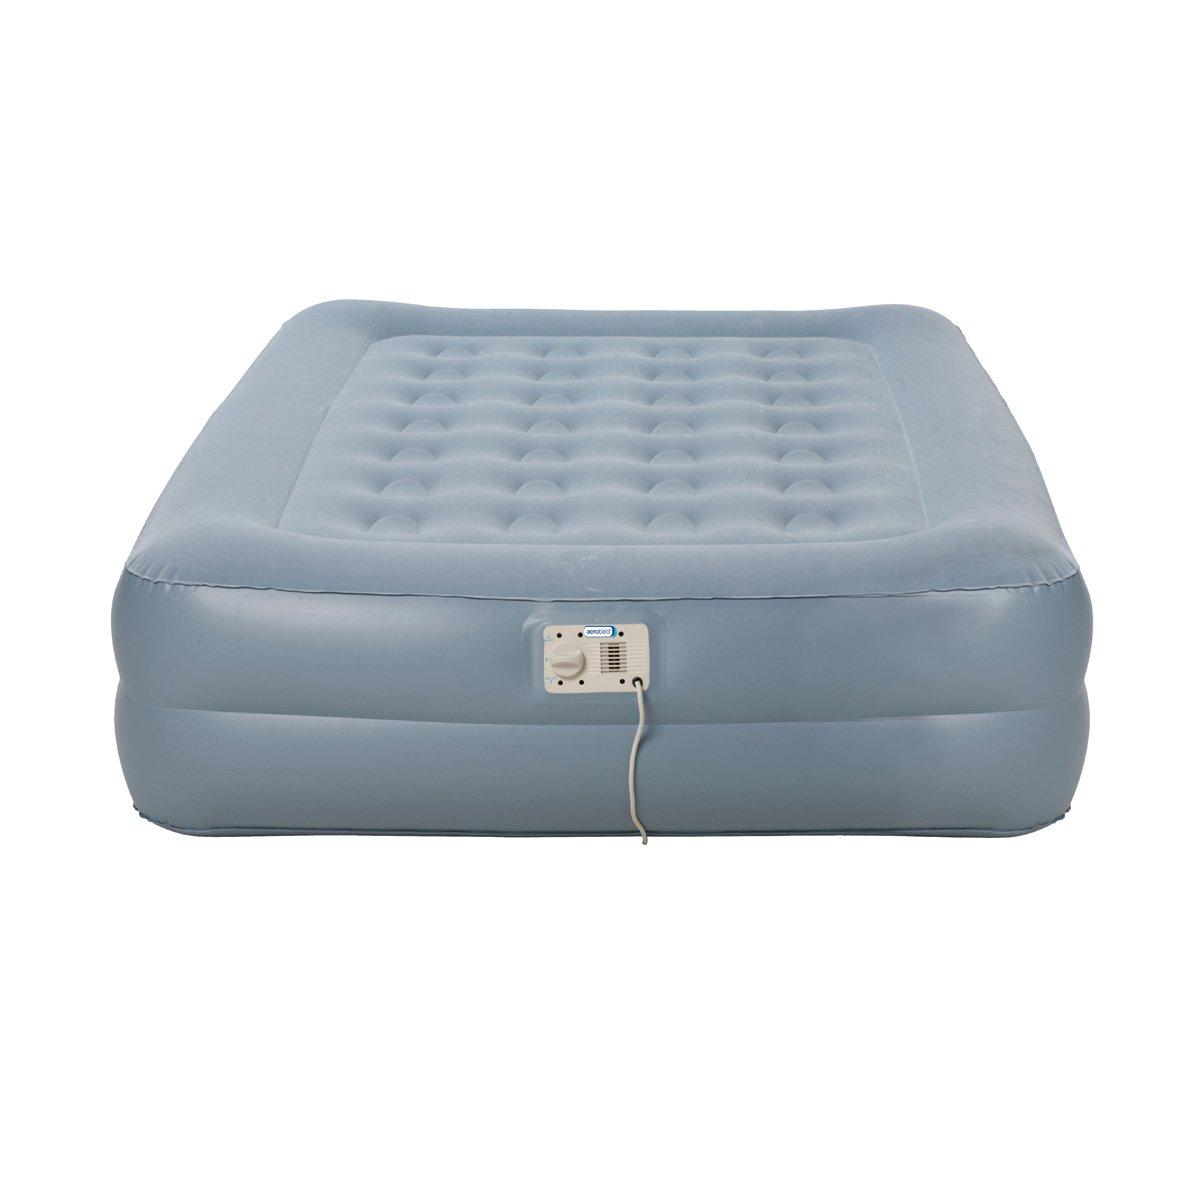 image-Aerobed Sleep Sound Raised Double Inflatable Airbed